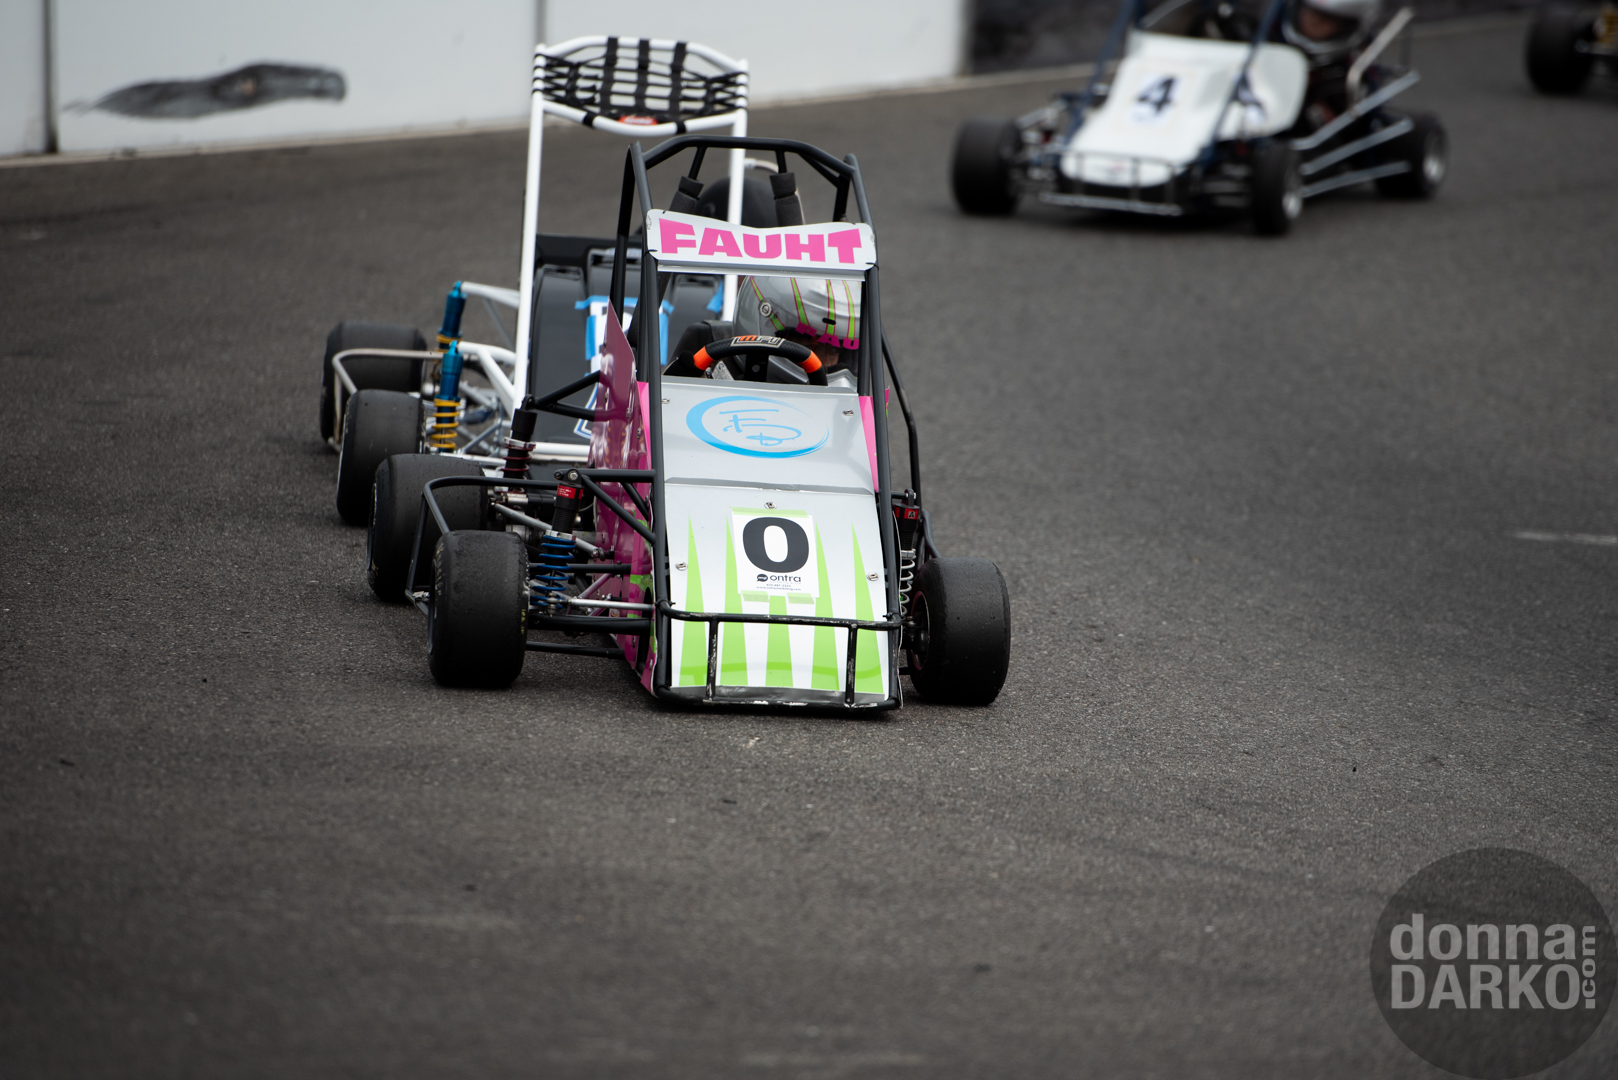 QWMA (Racing) 8-11-2019 DSC_6956.jpg